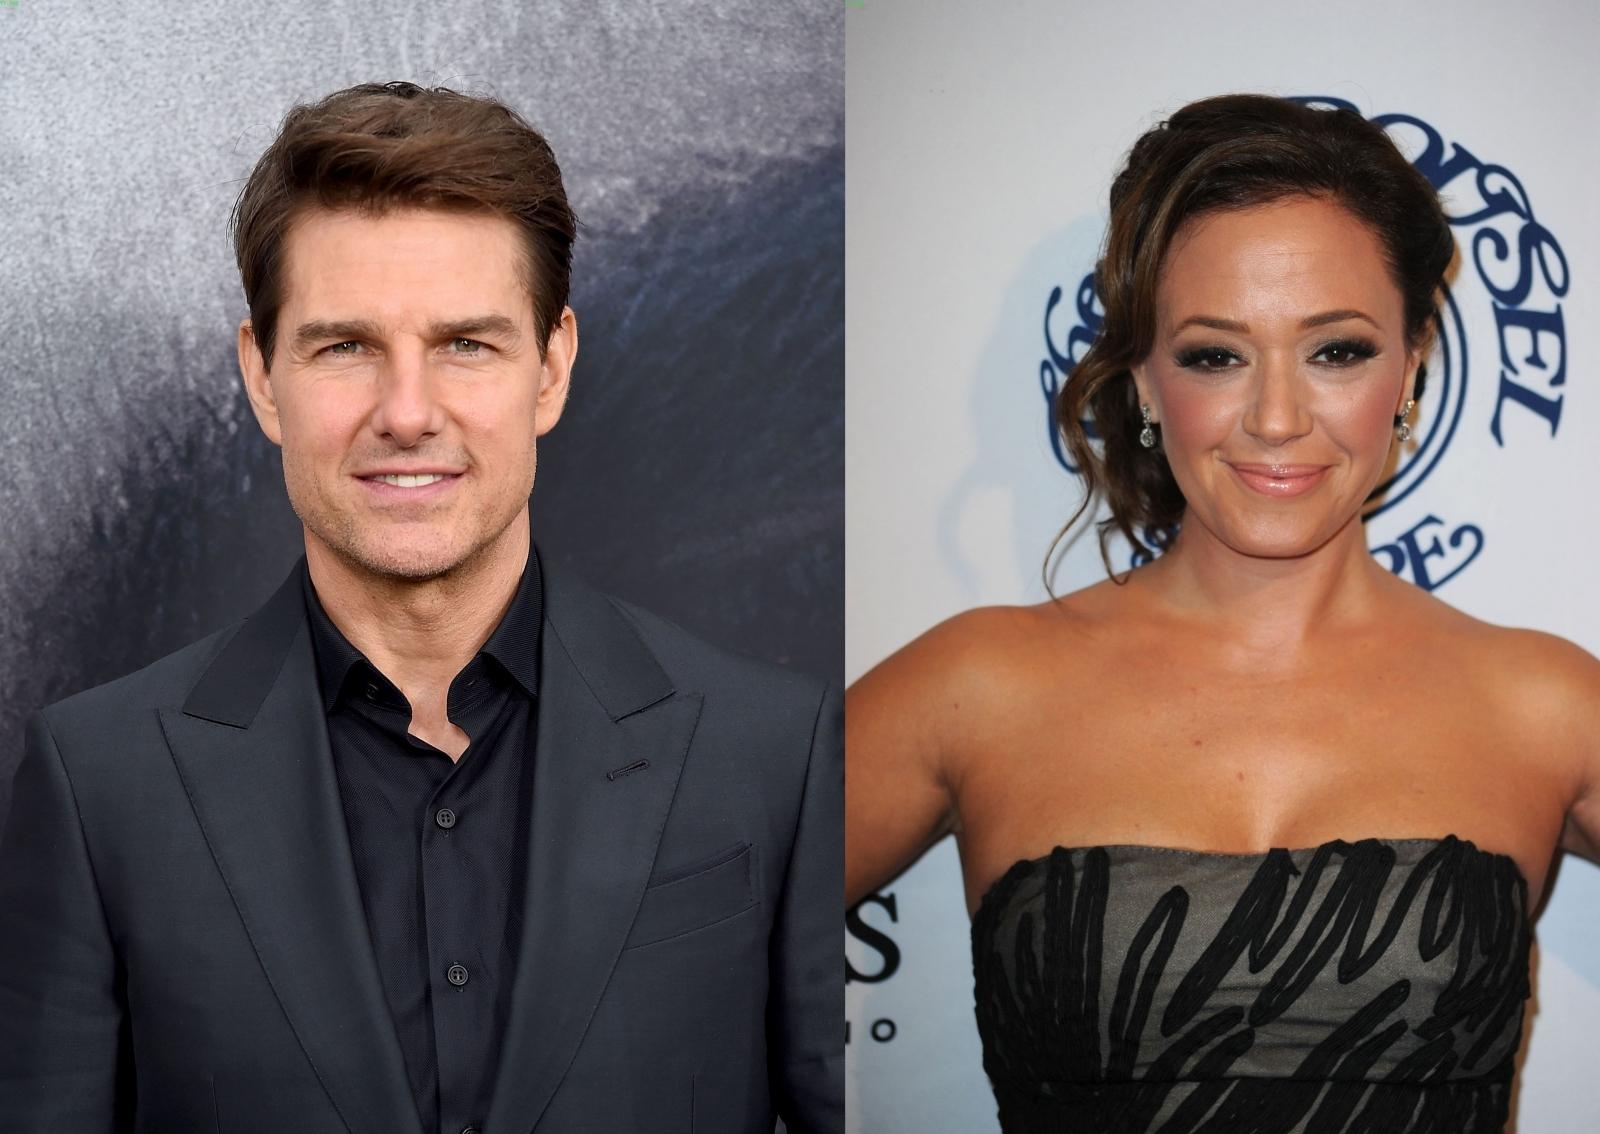 Tom Cruise and Leah Remini